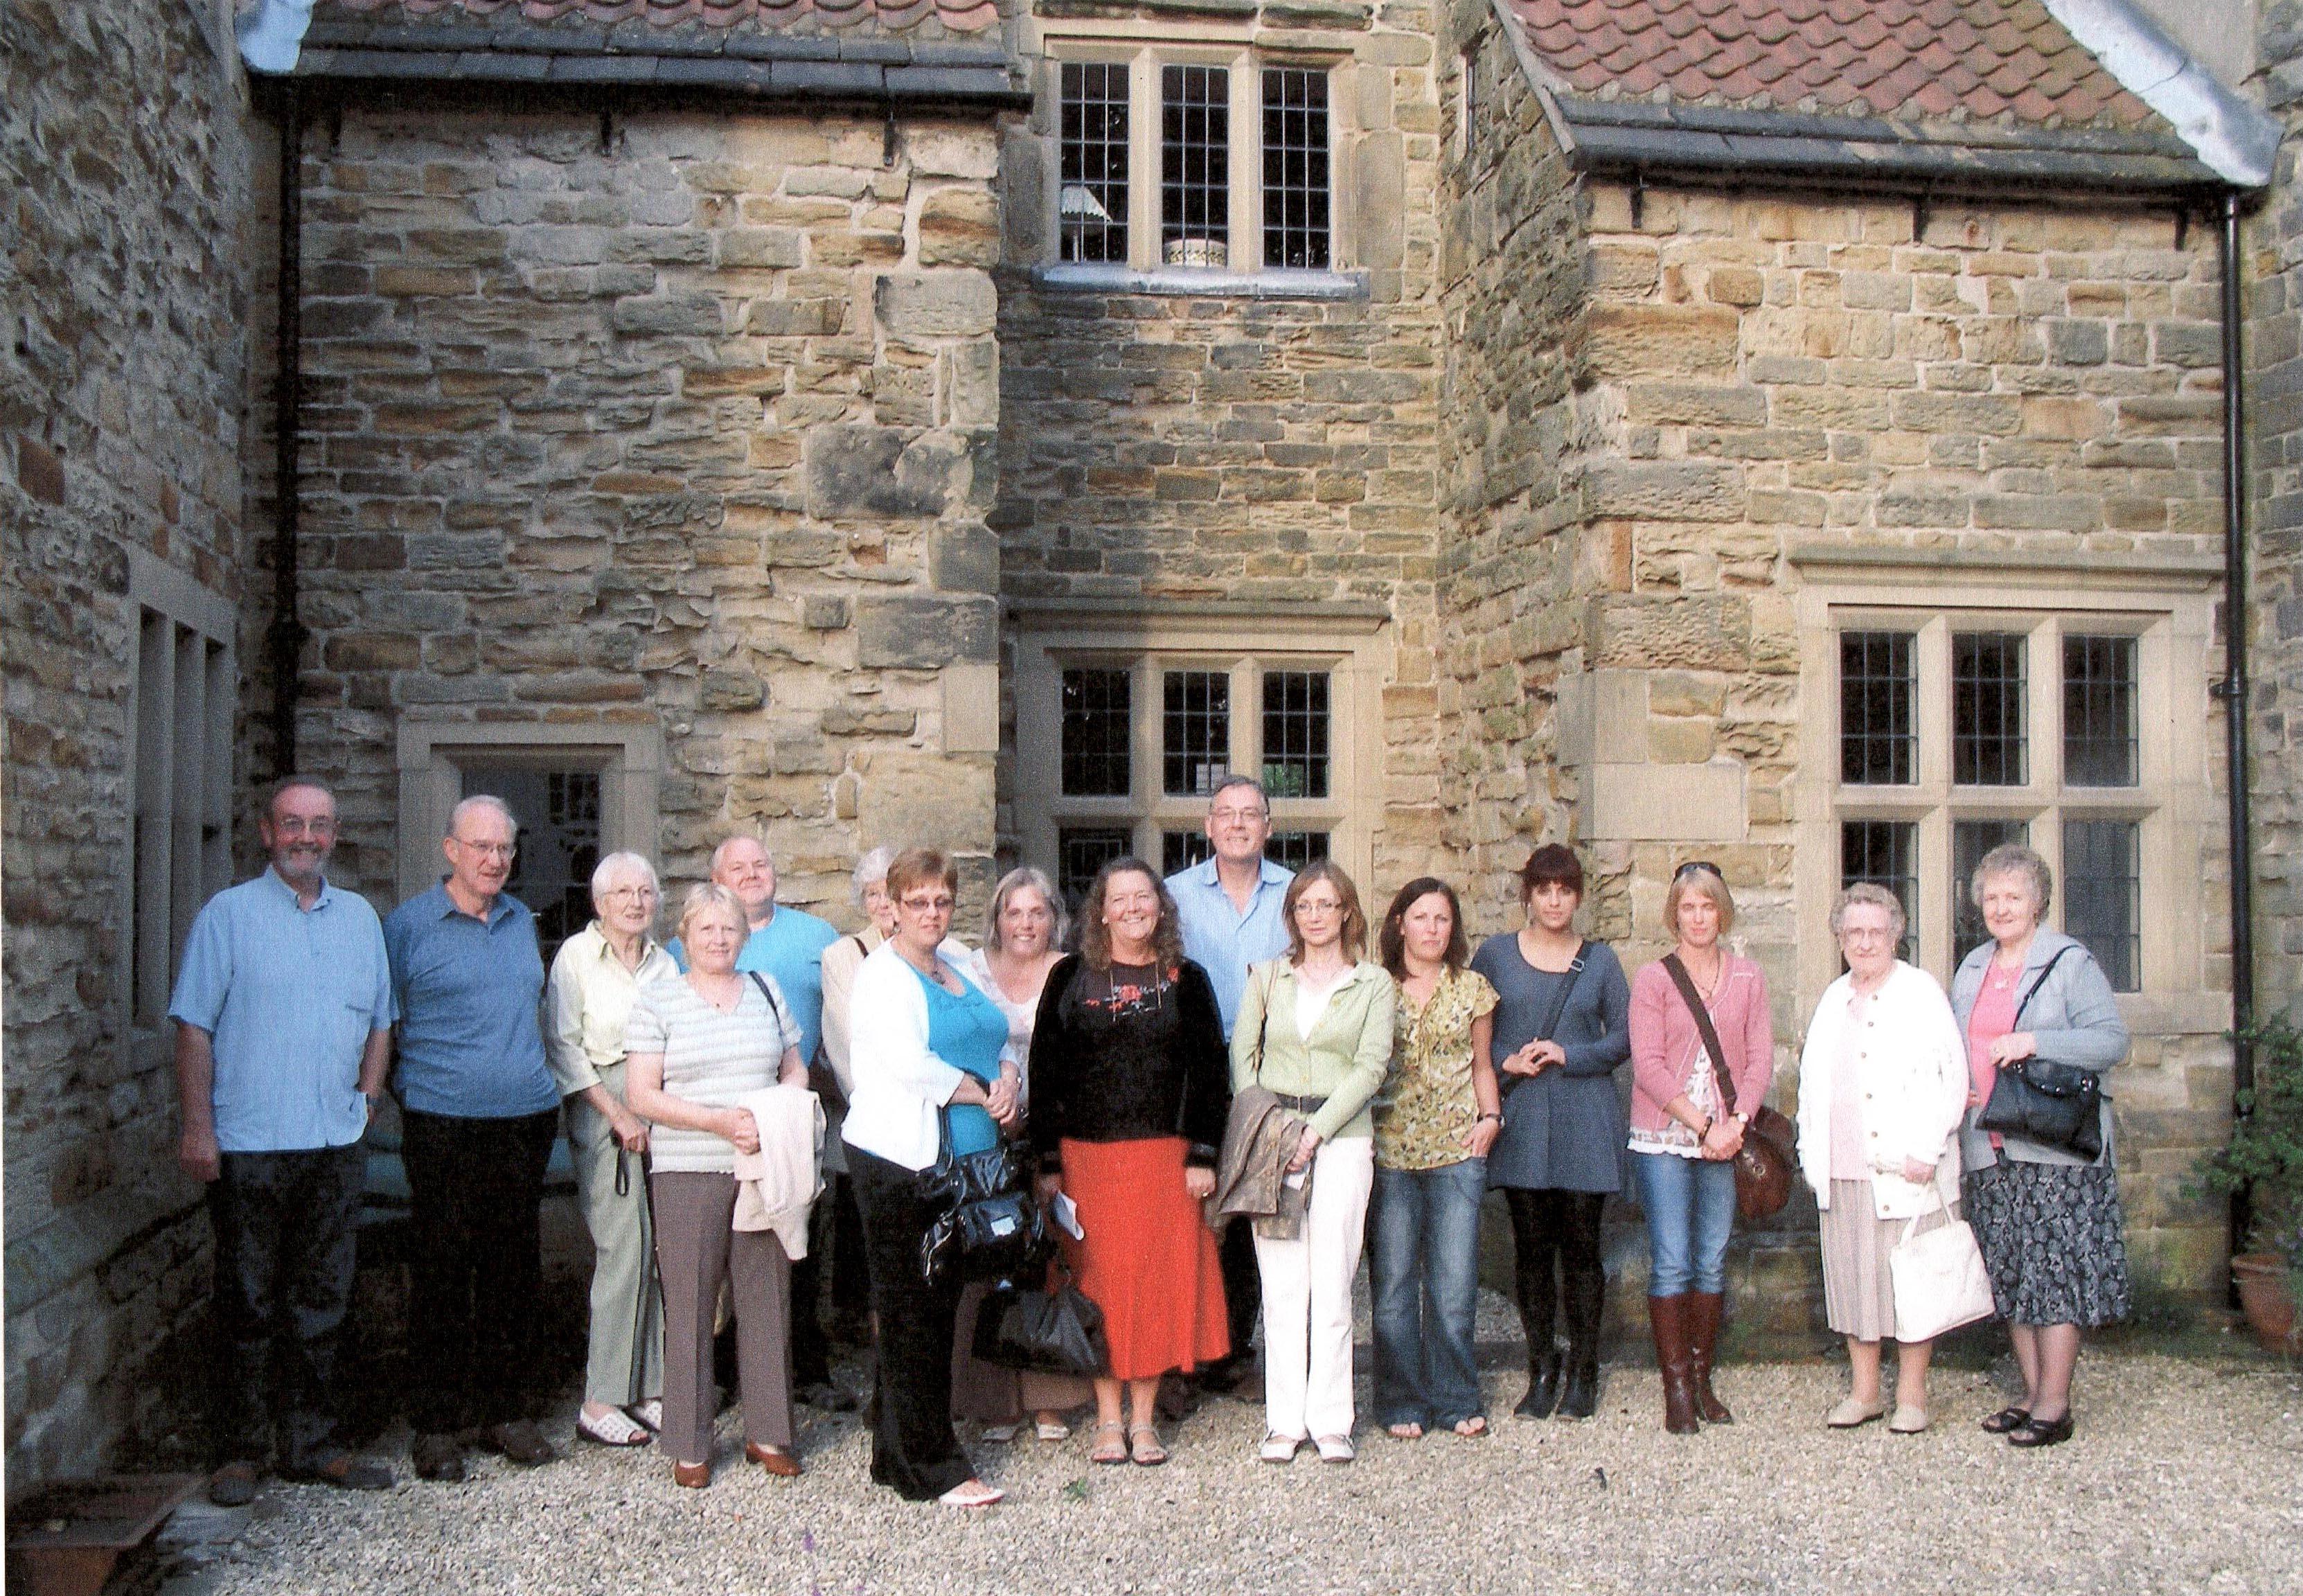 barlborough heritage and resource centre